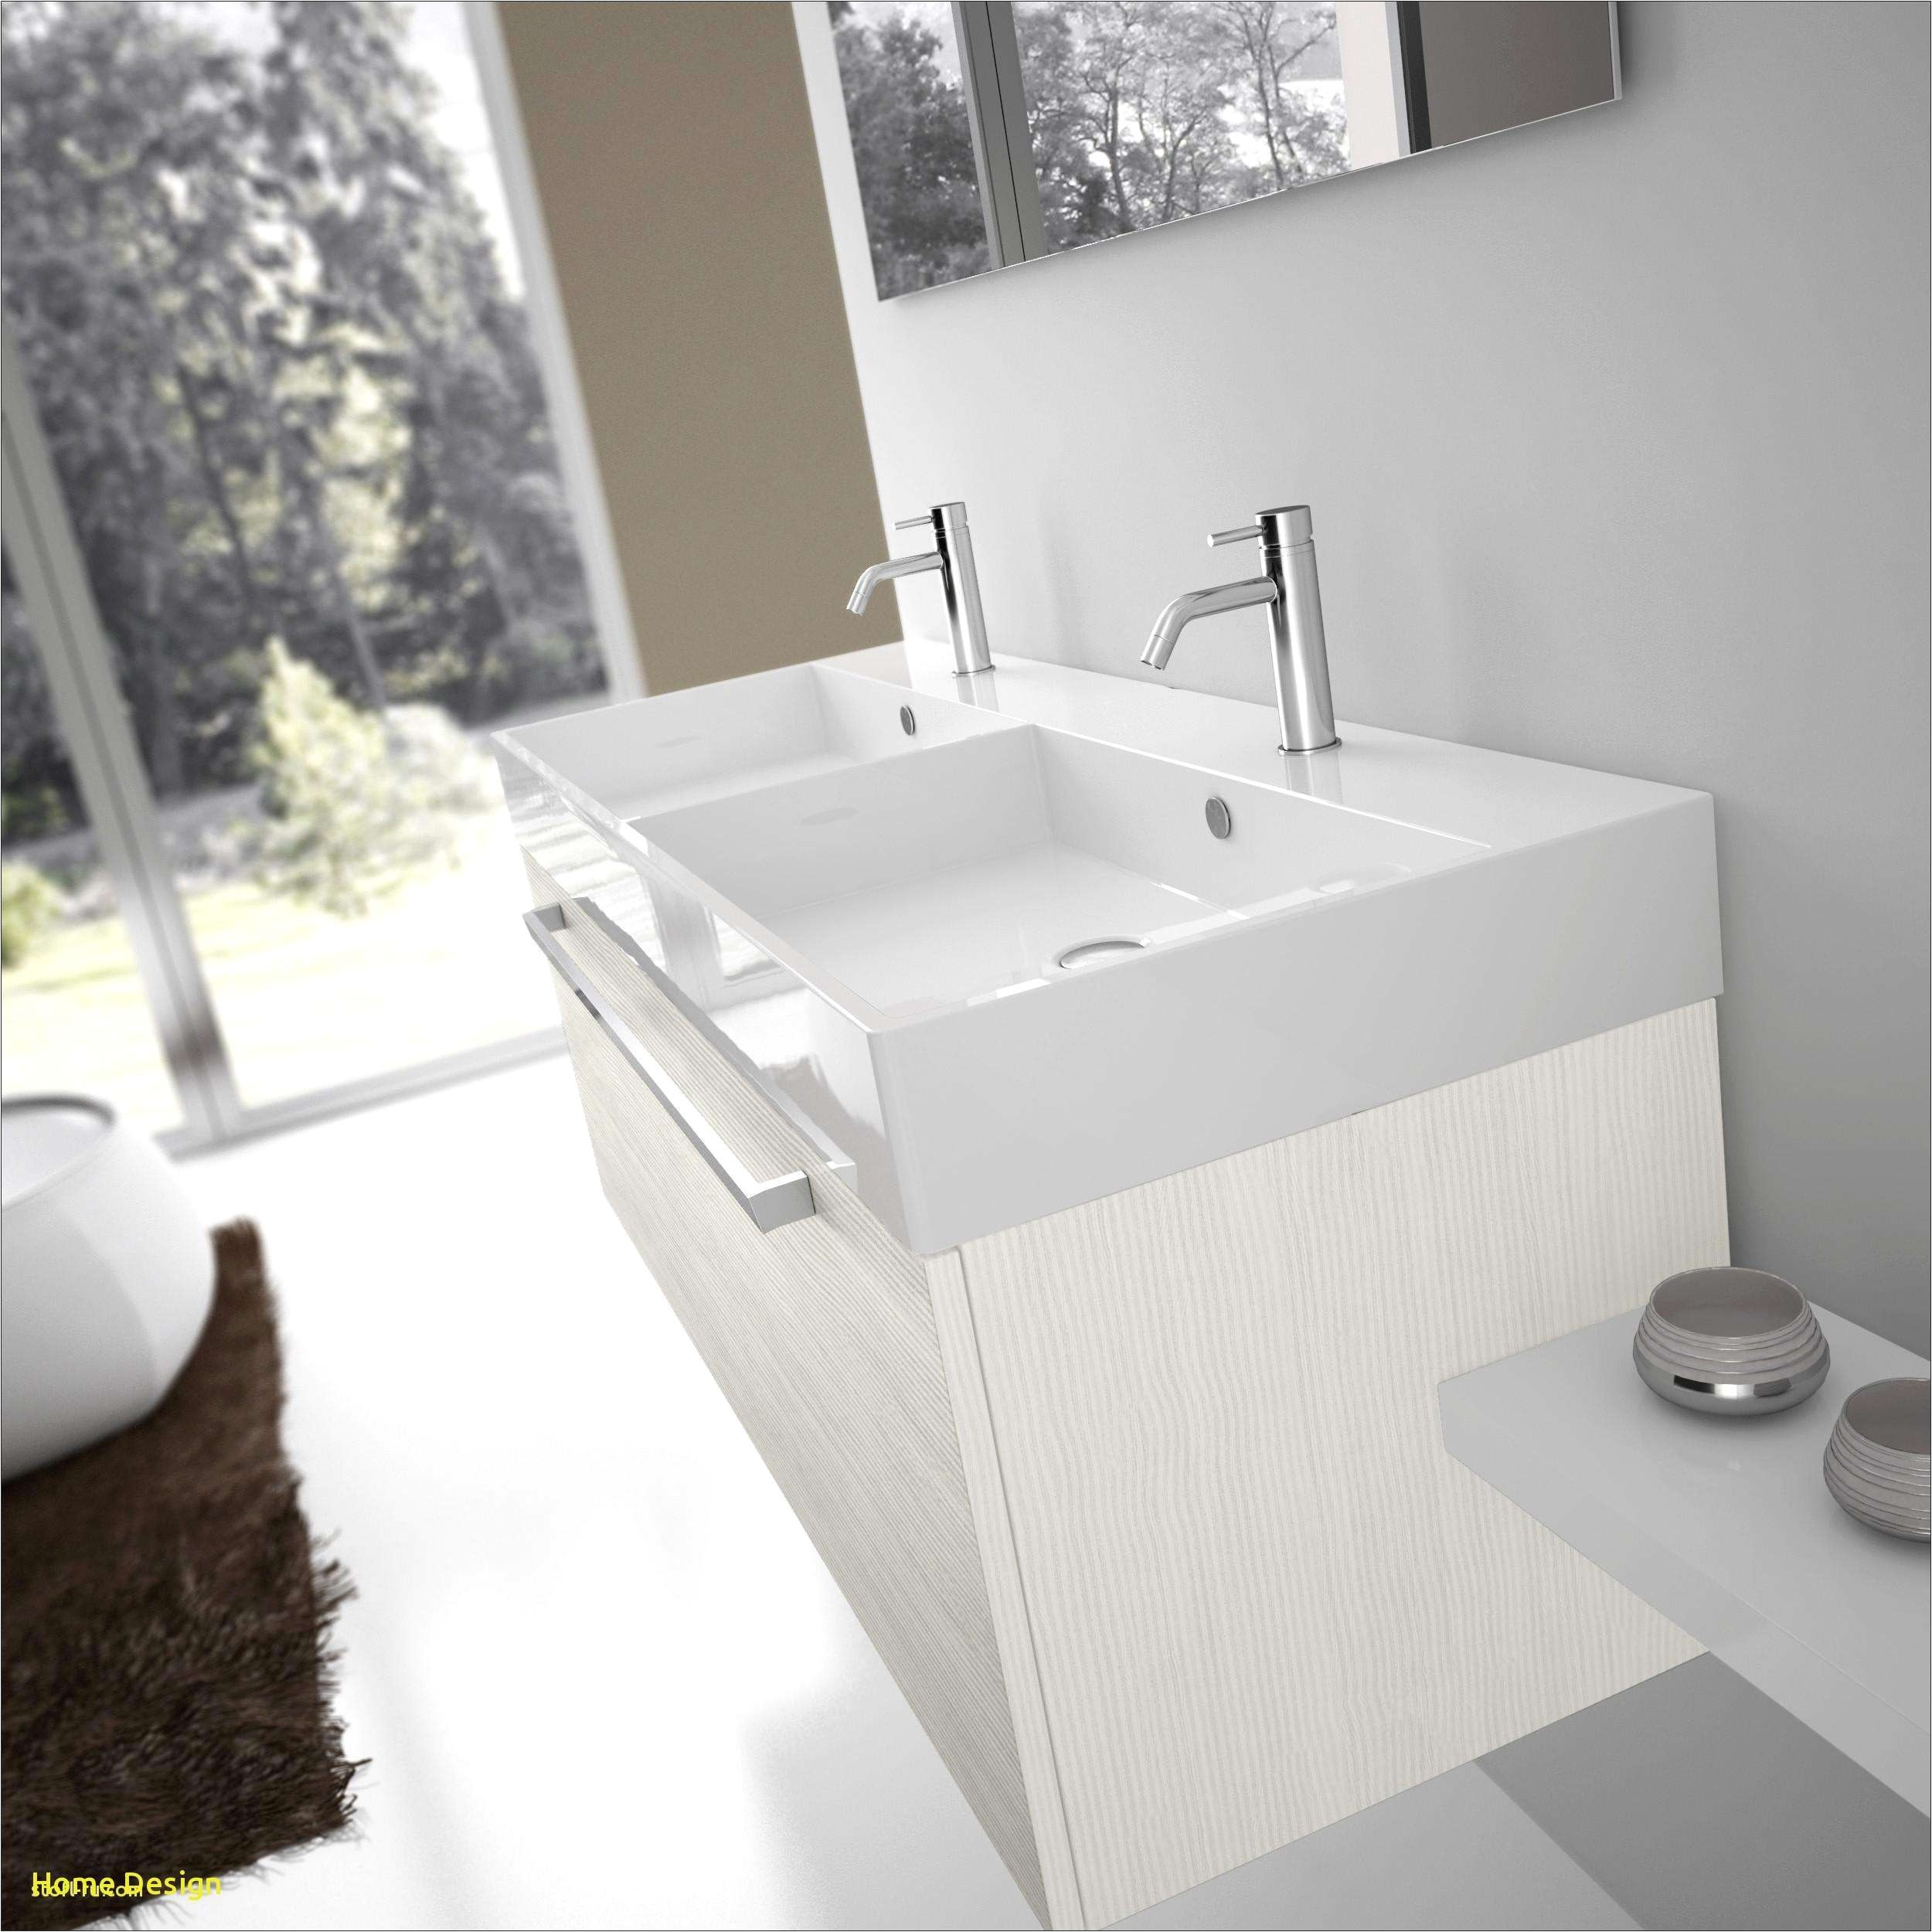 1 2 Bathroom Design Ideas Fabulous Chanel Bathroom Ideas